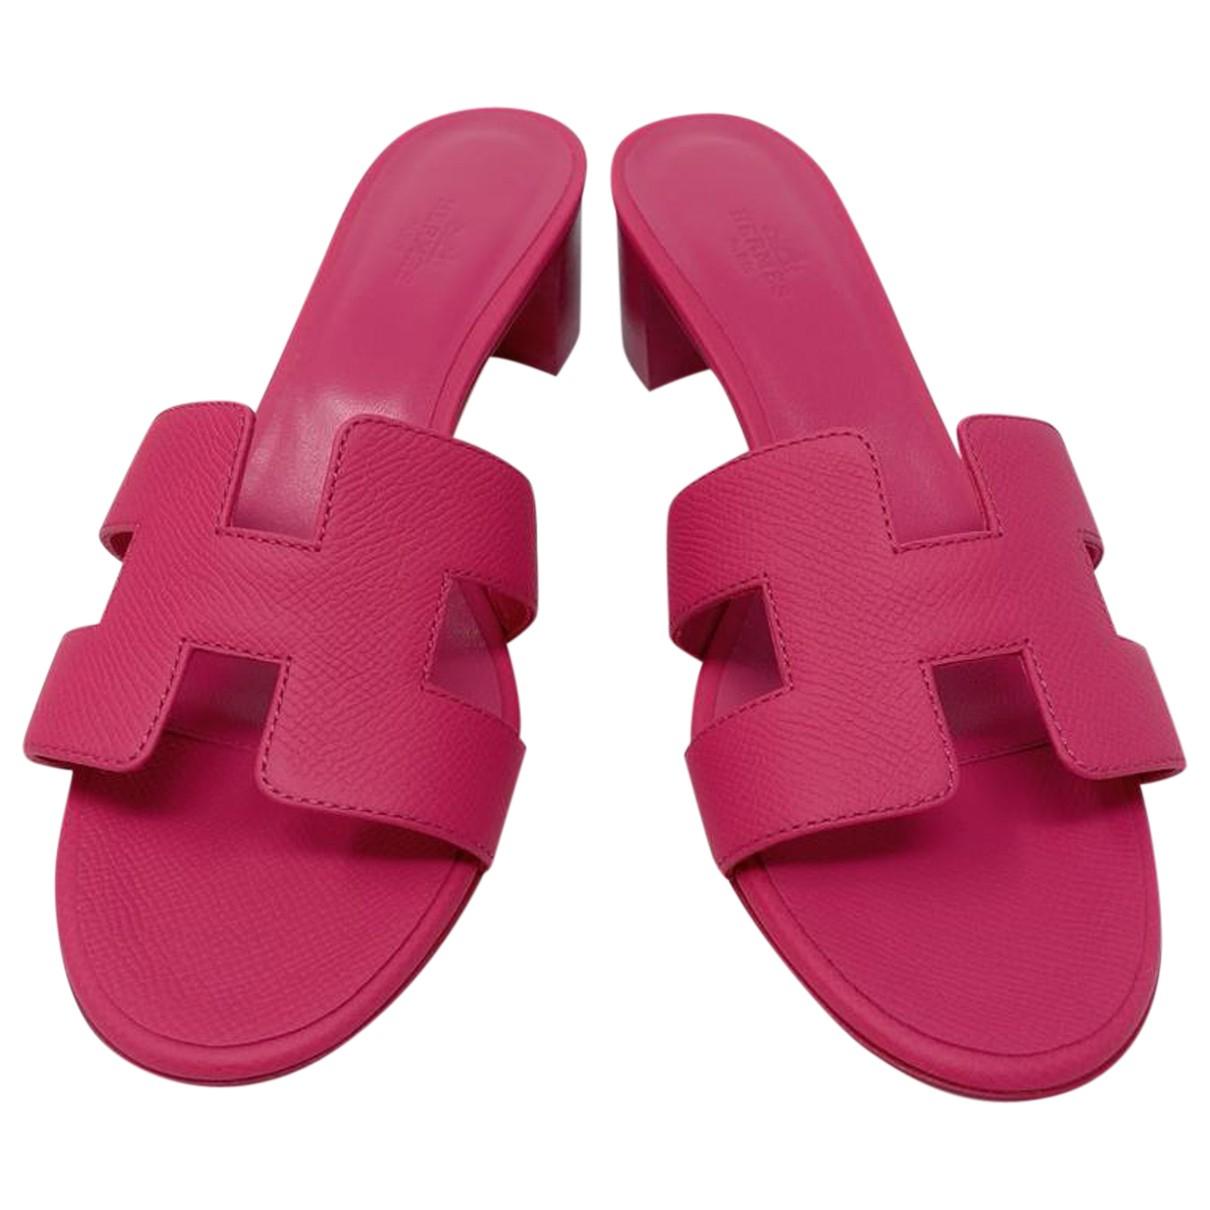 Hermes - Sandales Oasis pour femme en cuir - rose